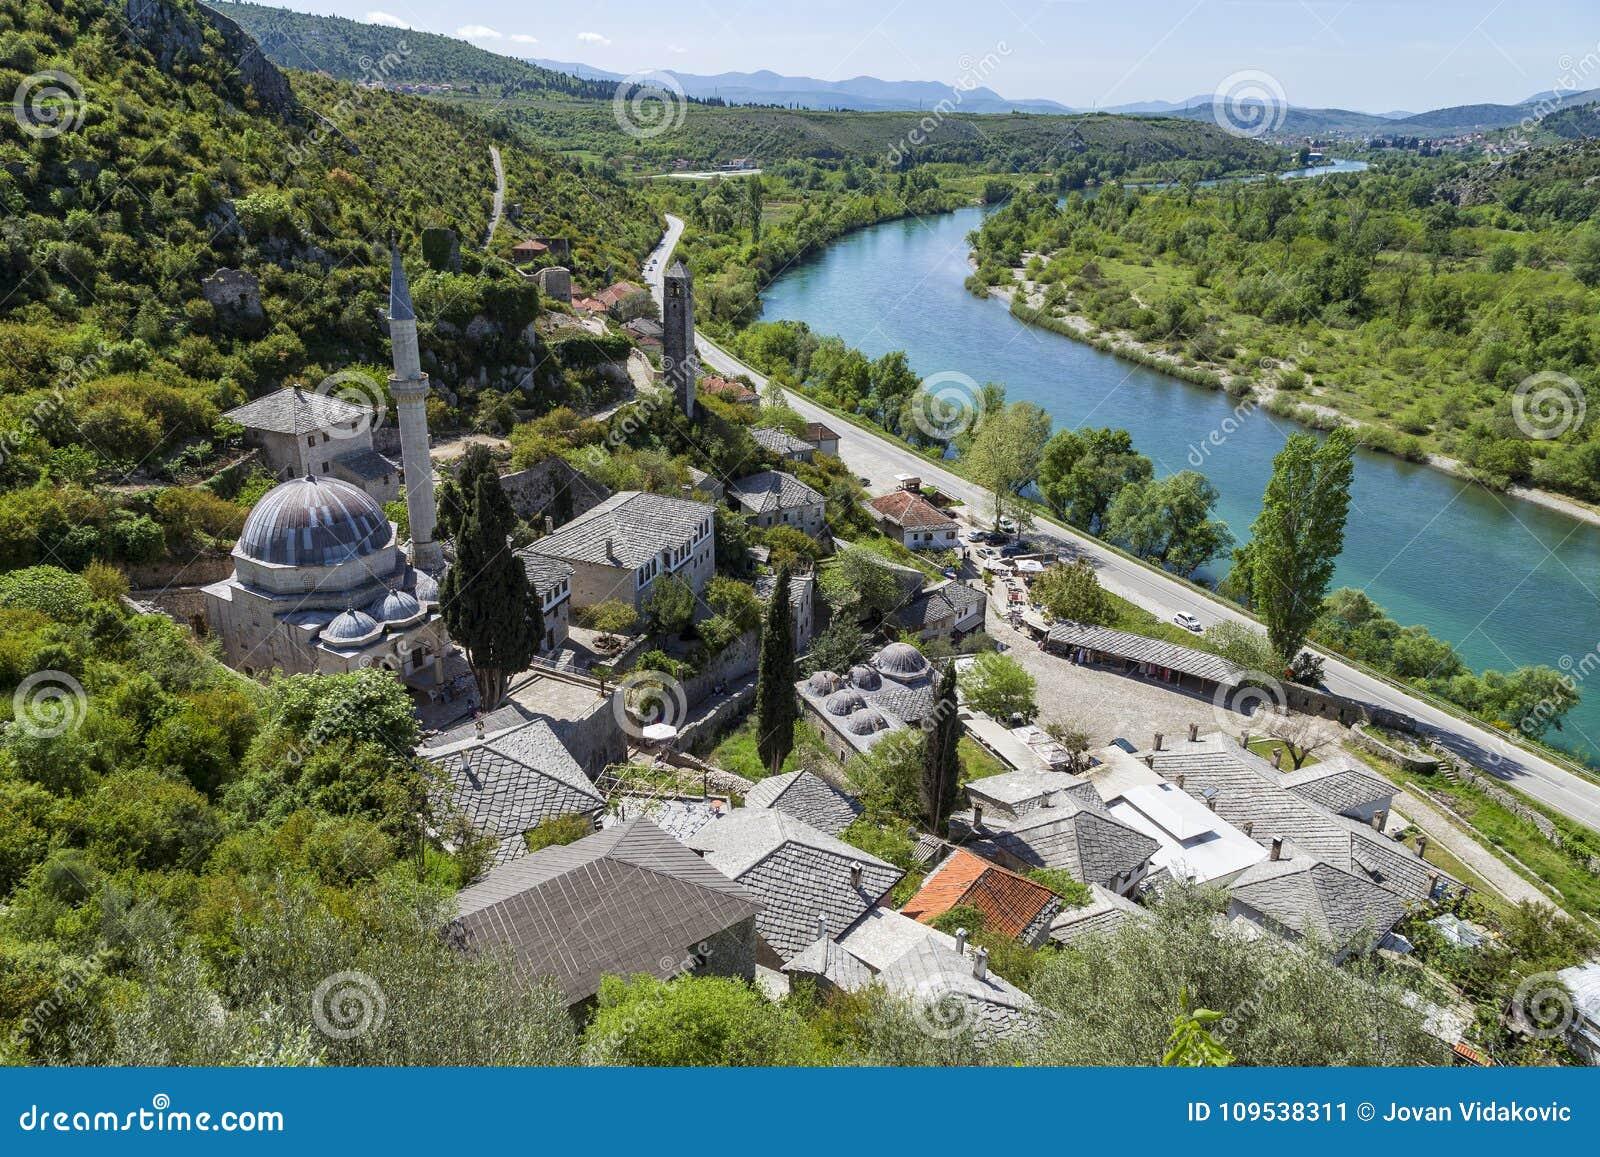 Dating in bosnia and herzegovina